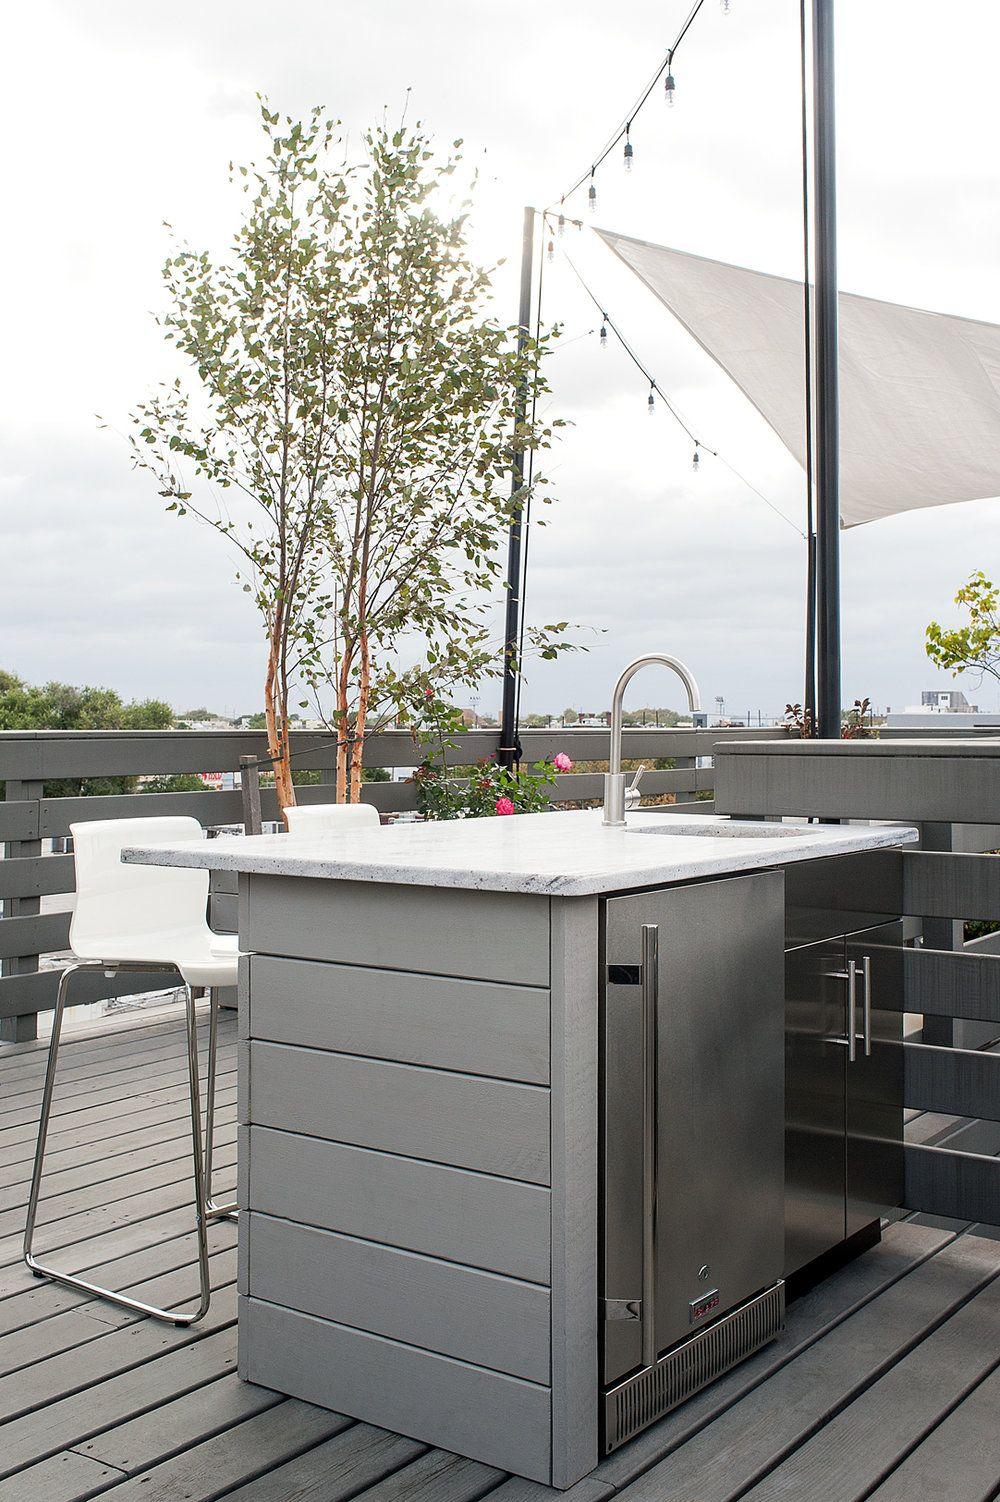 Philadelphia Outdoor Refrigerator Outdoor Refrigerator Roof Deck Roof